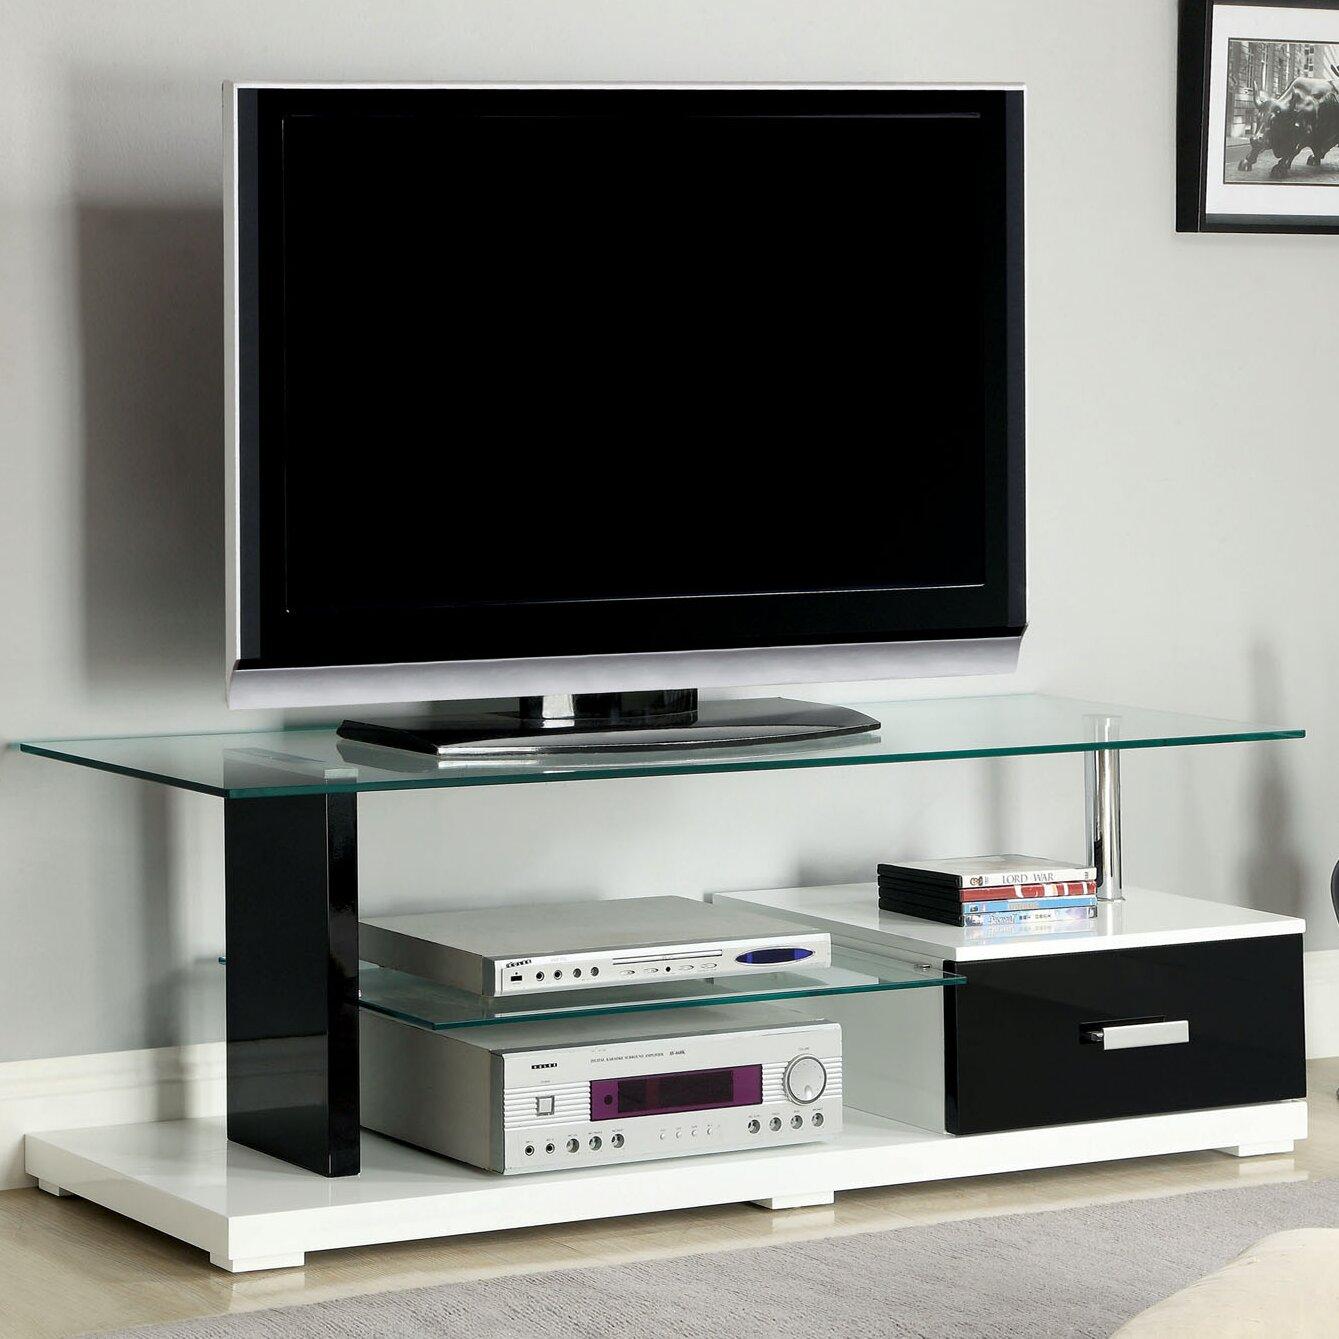 Hokku Designs Mayse Tv Stand Reviews Wayfair